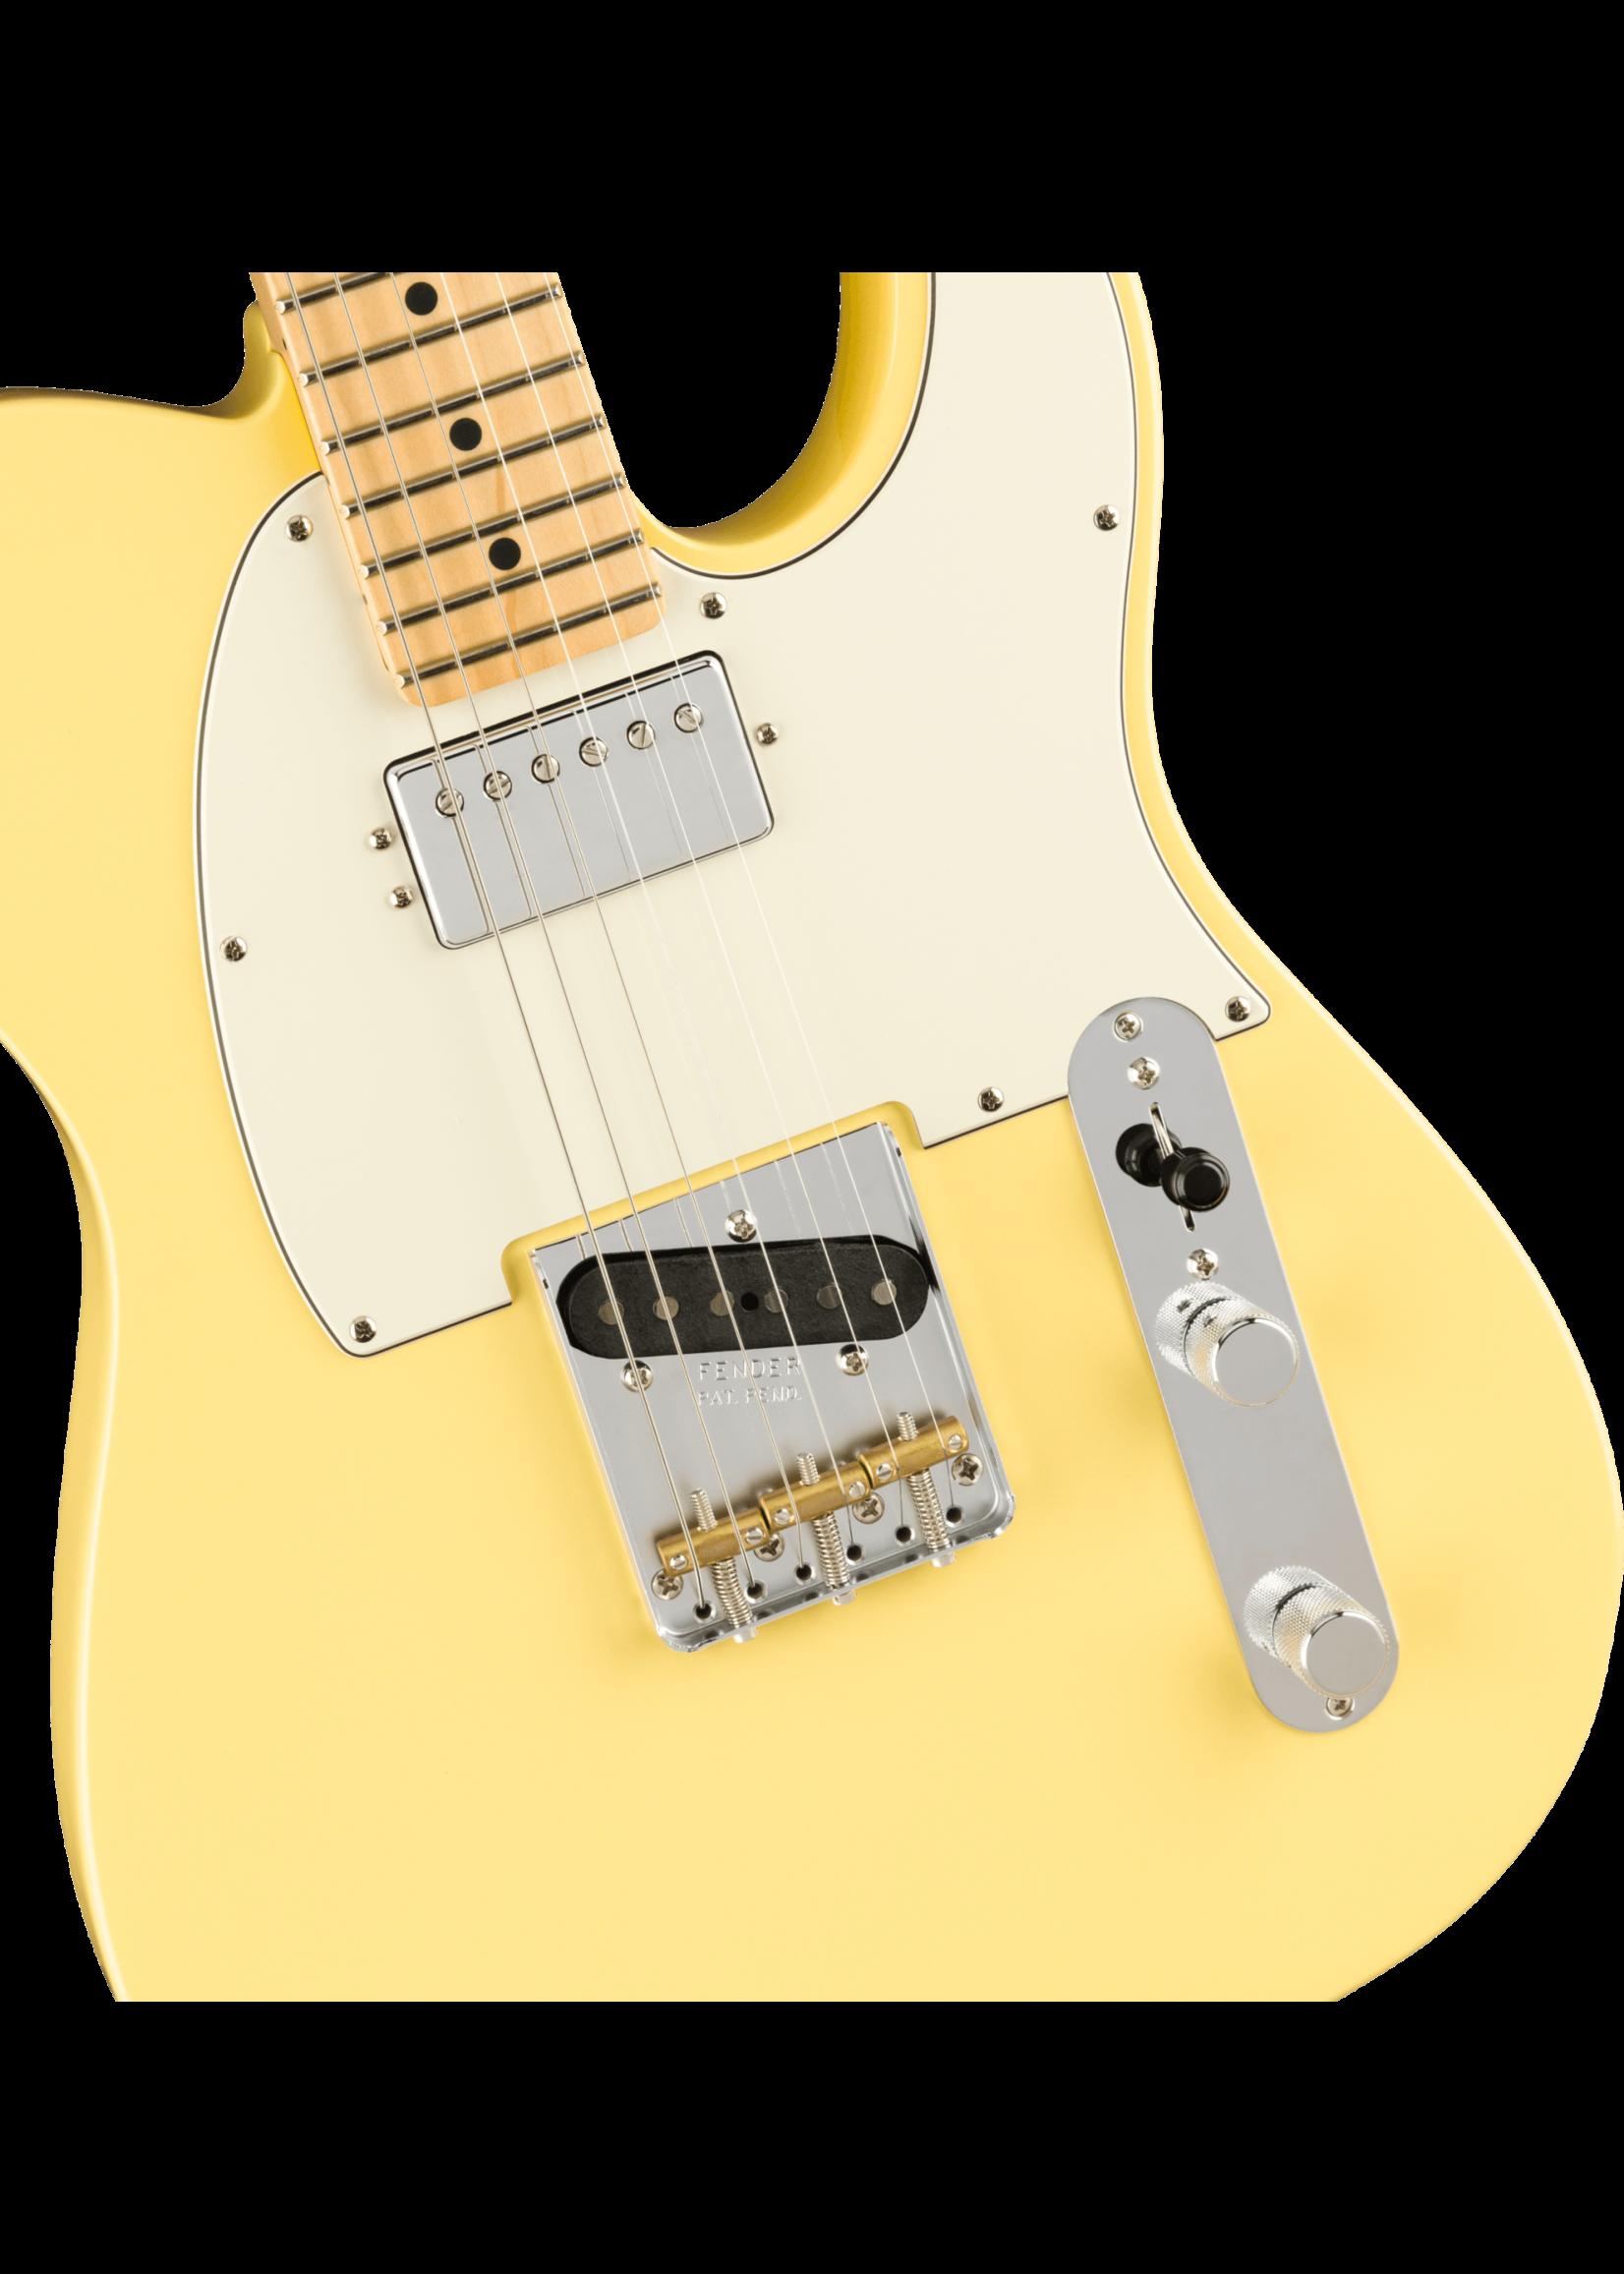 Fender Fender American Performer Telecaster® with Humbucking Vintage White Maple Fingerboard